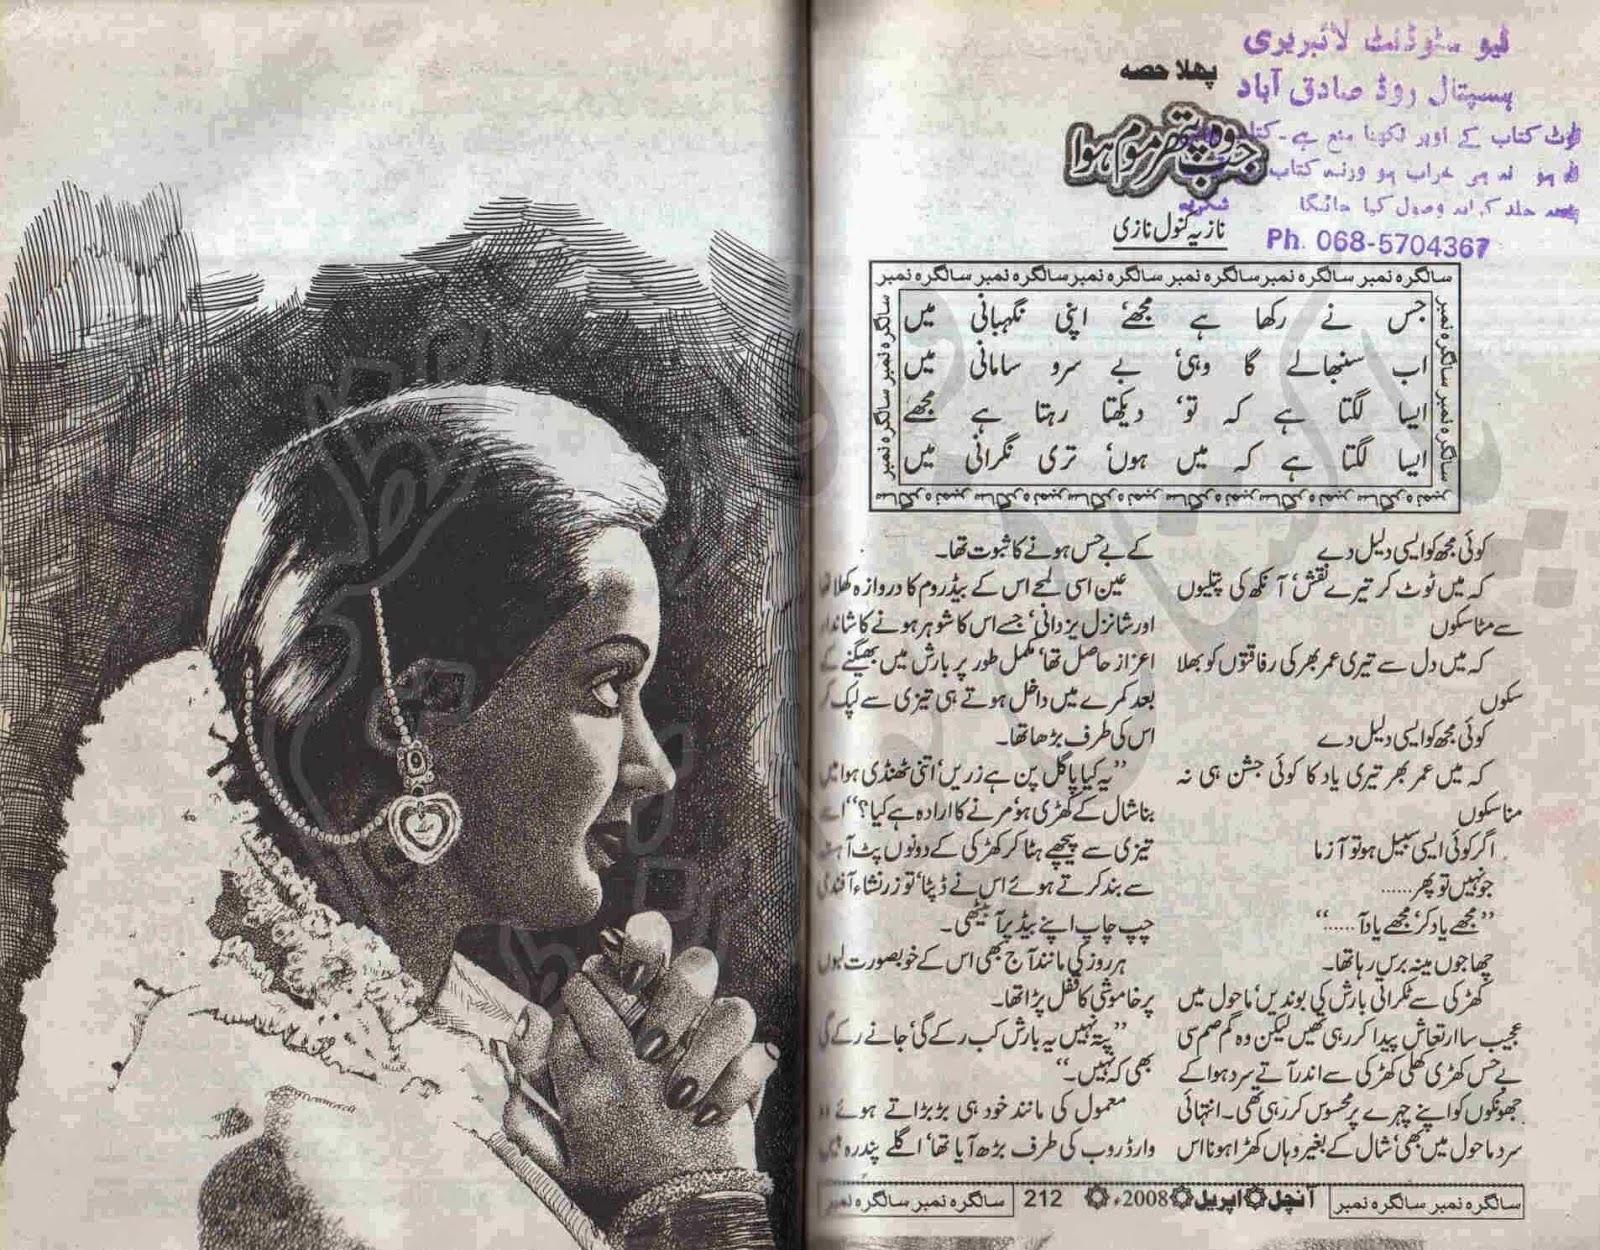 Kitab dost romantic novels | EZ Readings: Khwab main tabeer or tum